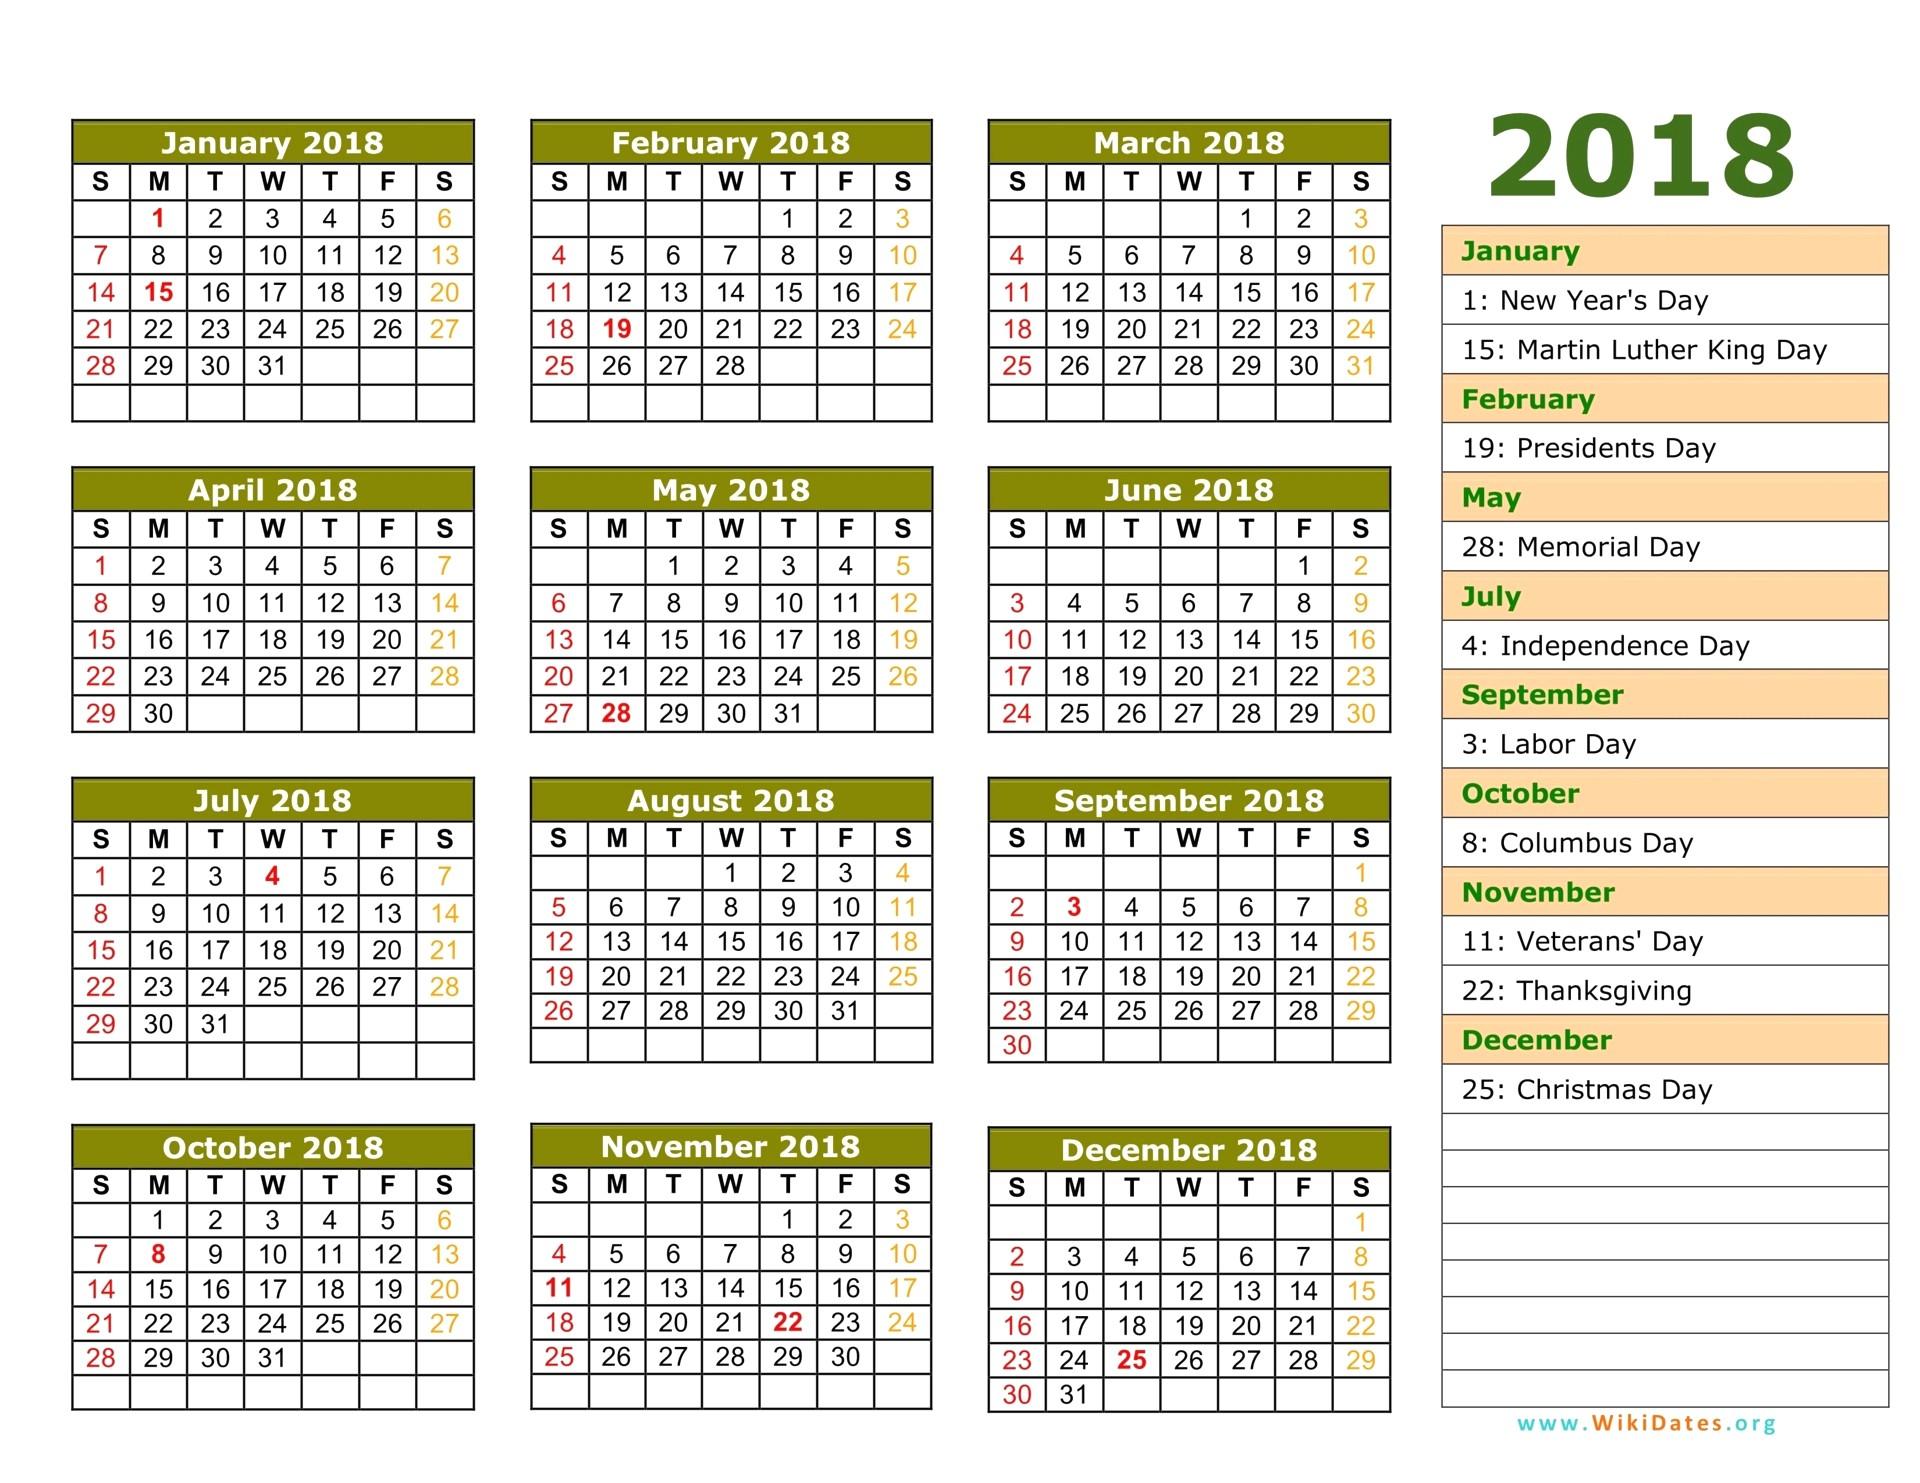 Calendar 2019 Usa Más Populares New 45 Examples Ocps Calendar 2019 Of Calendar 2019 Usa Más Recientes Weight Loss Calendar 2019 2019 Yearly Calendar Free Printable Simply